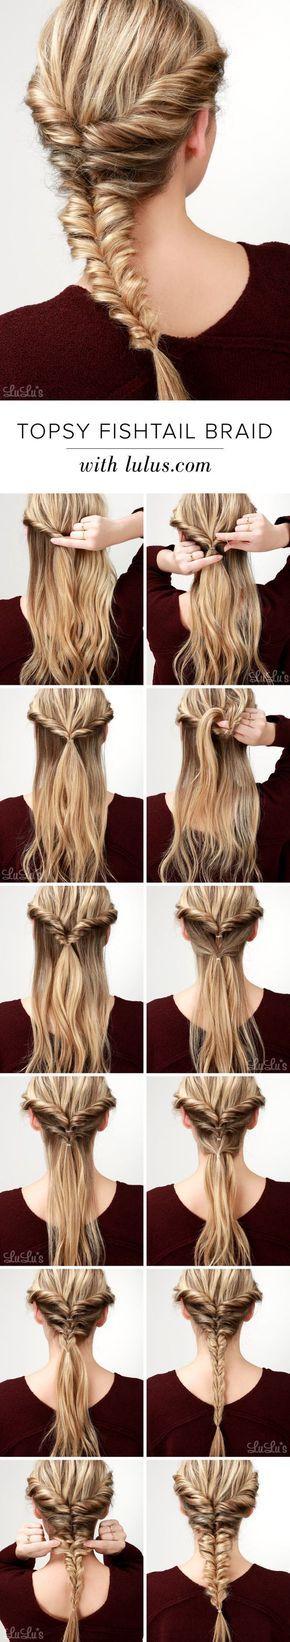 Pretty Braided Crown Hairstyle Tutorials and Ideas / http://www.himisspuff.com/easy-diy-braided-hairstyles-tutorials/46/